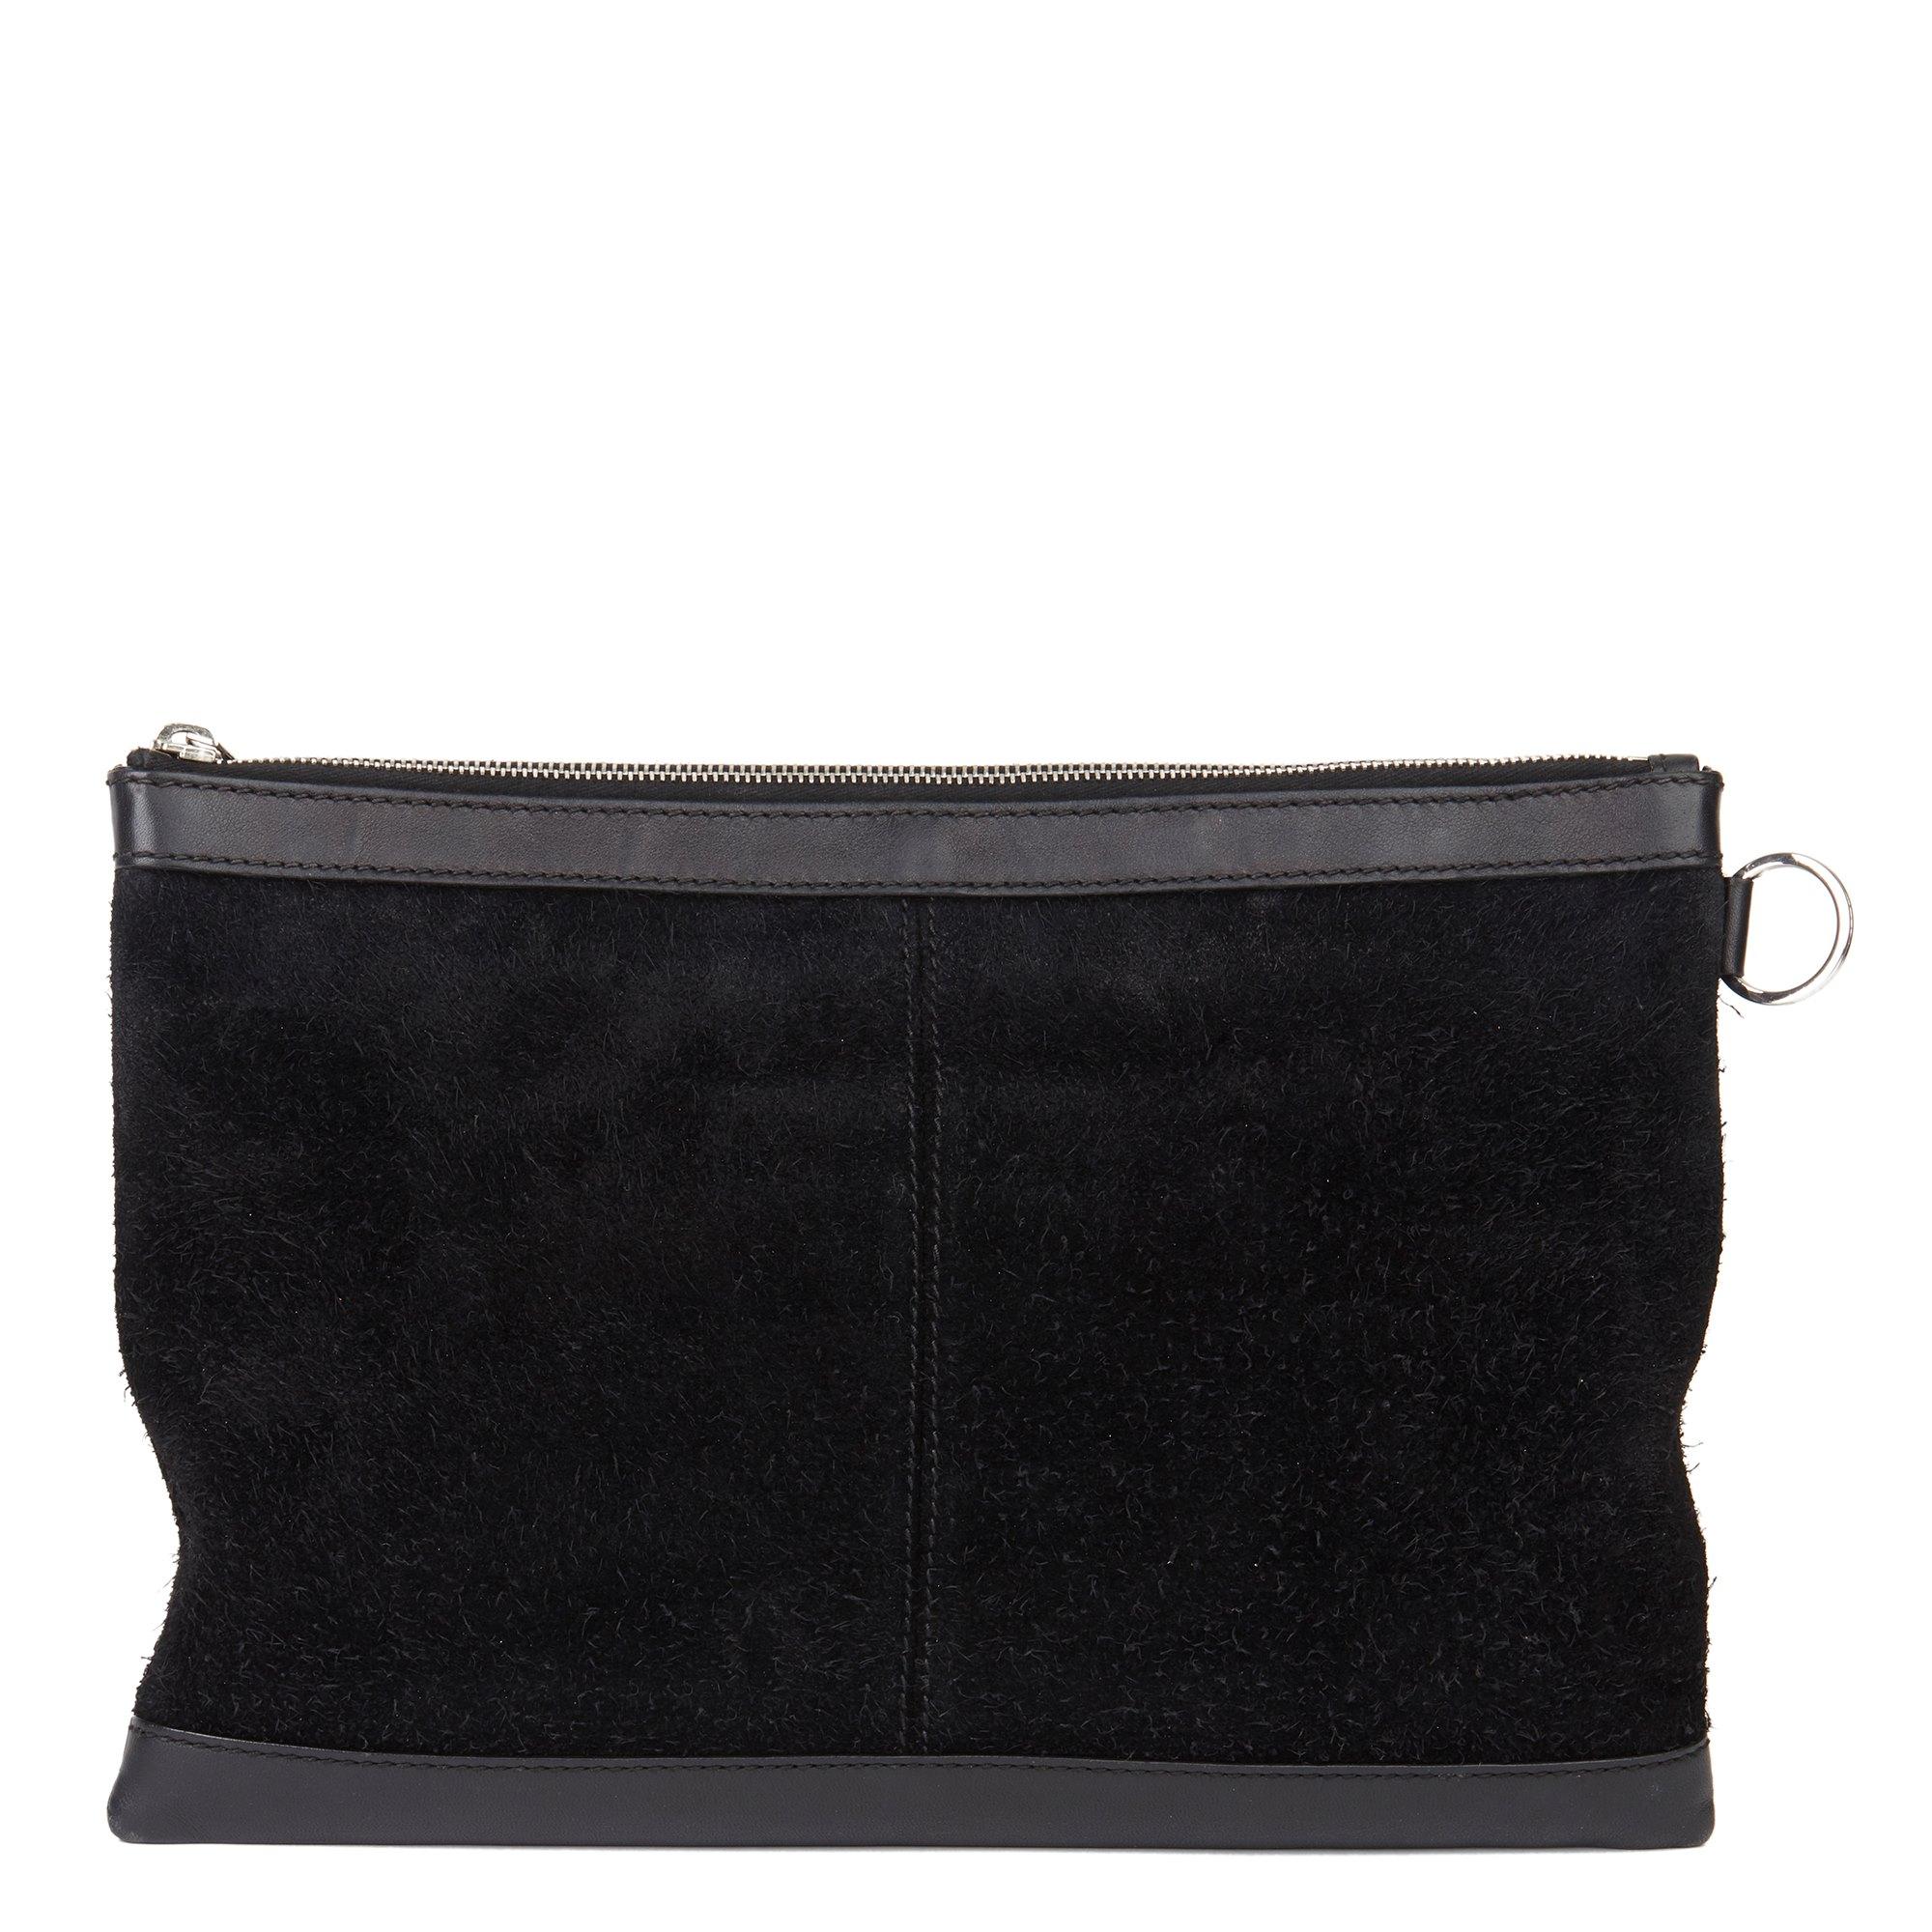 Balenciaga Black Calfskin Leather & Suede City Pouch